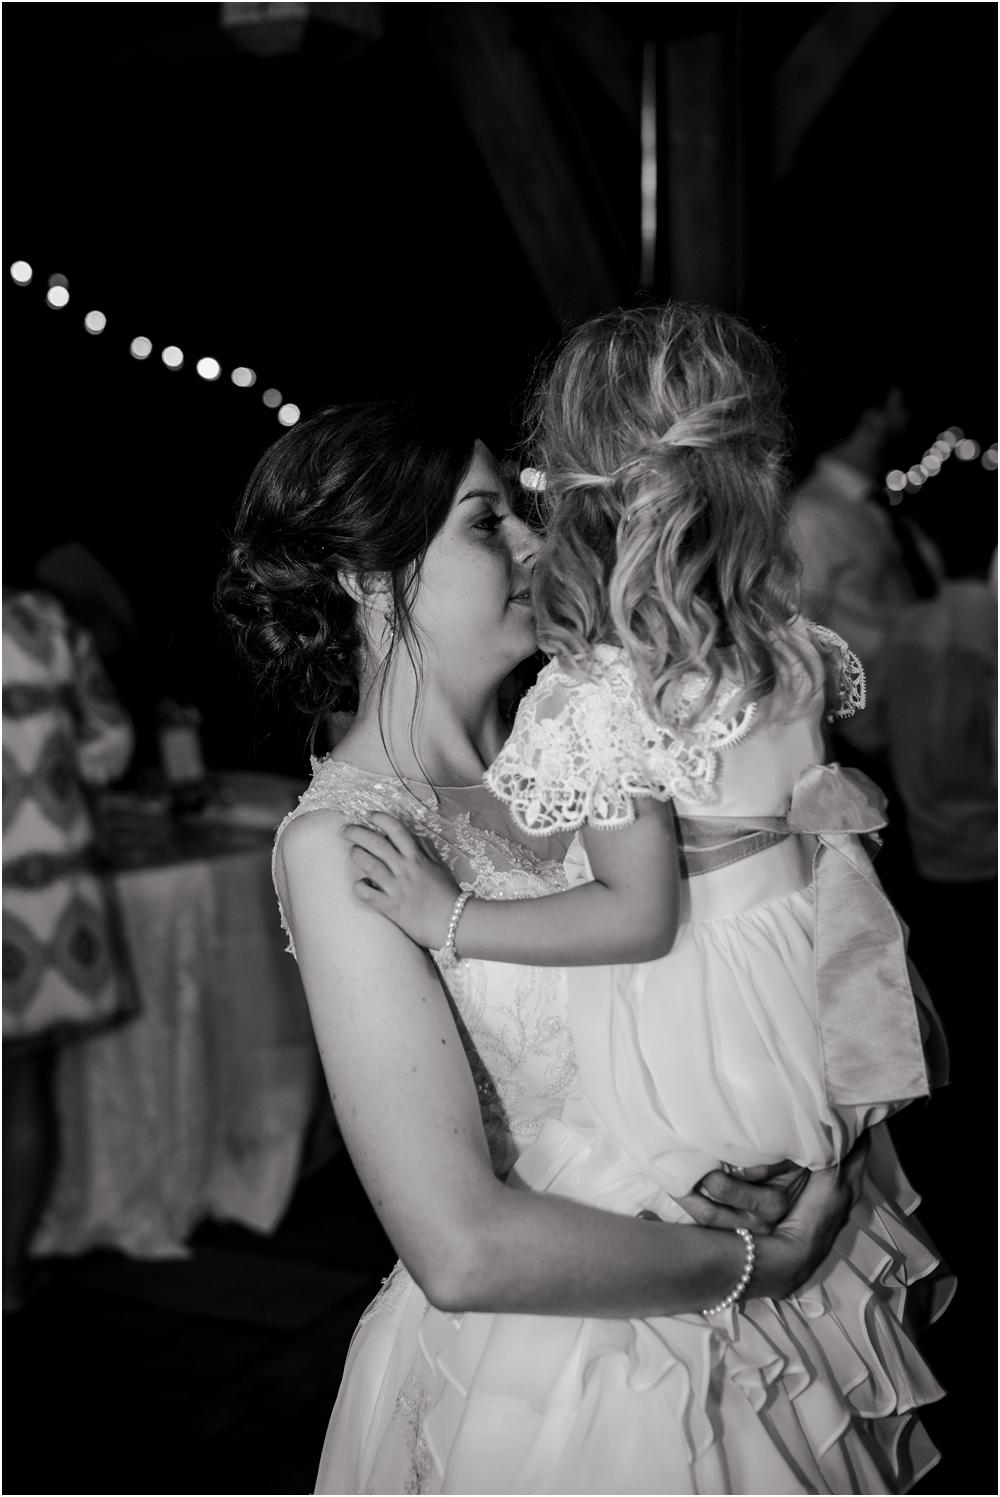 marianna-florida-wedding-photographer-kiersten-grant-207.jpg